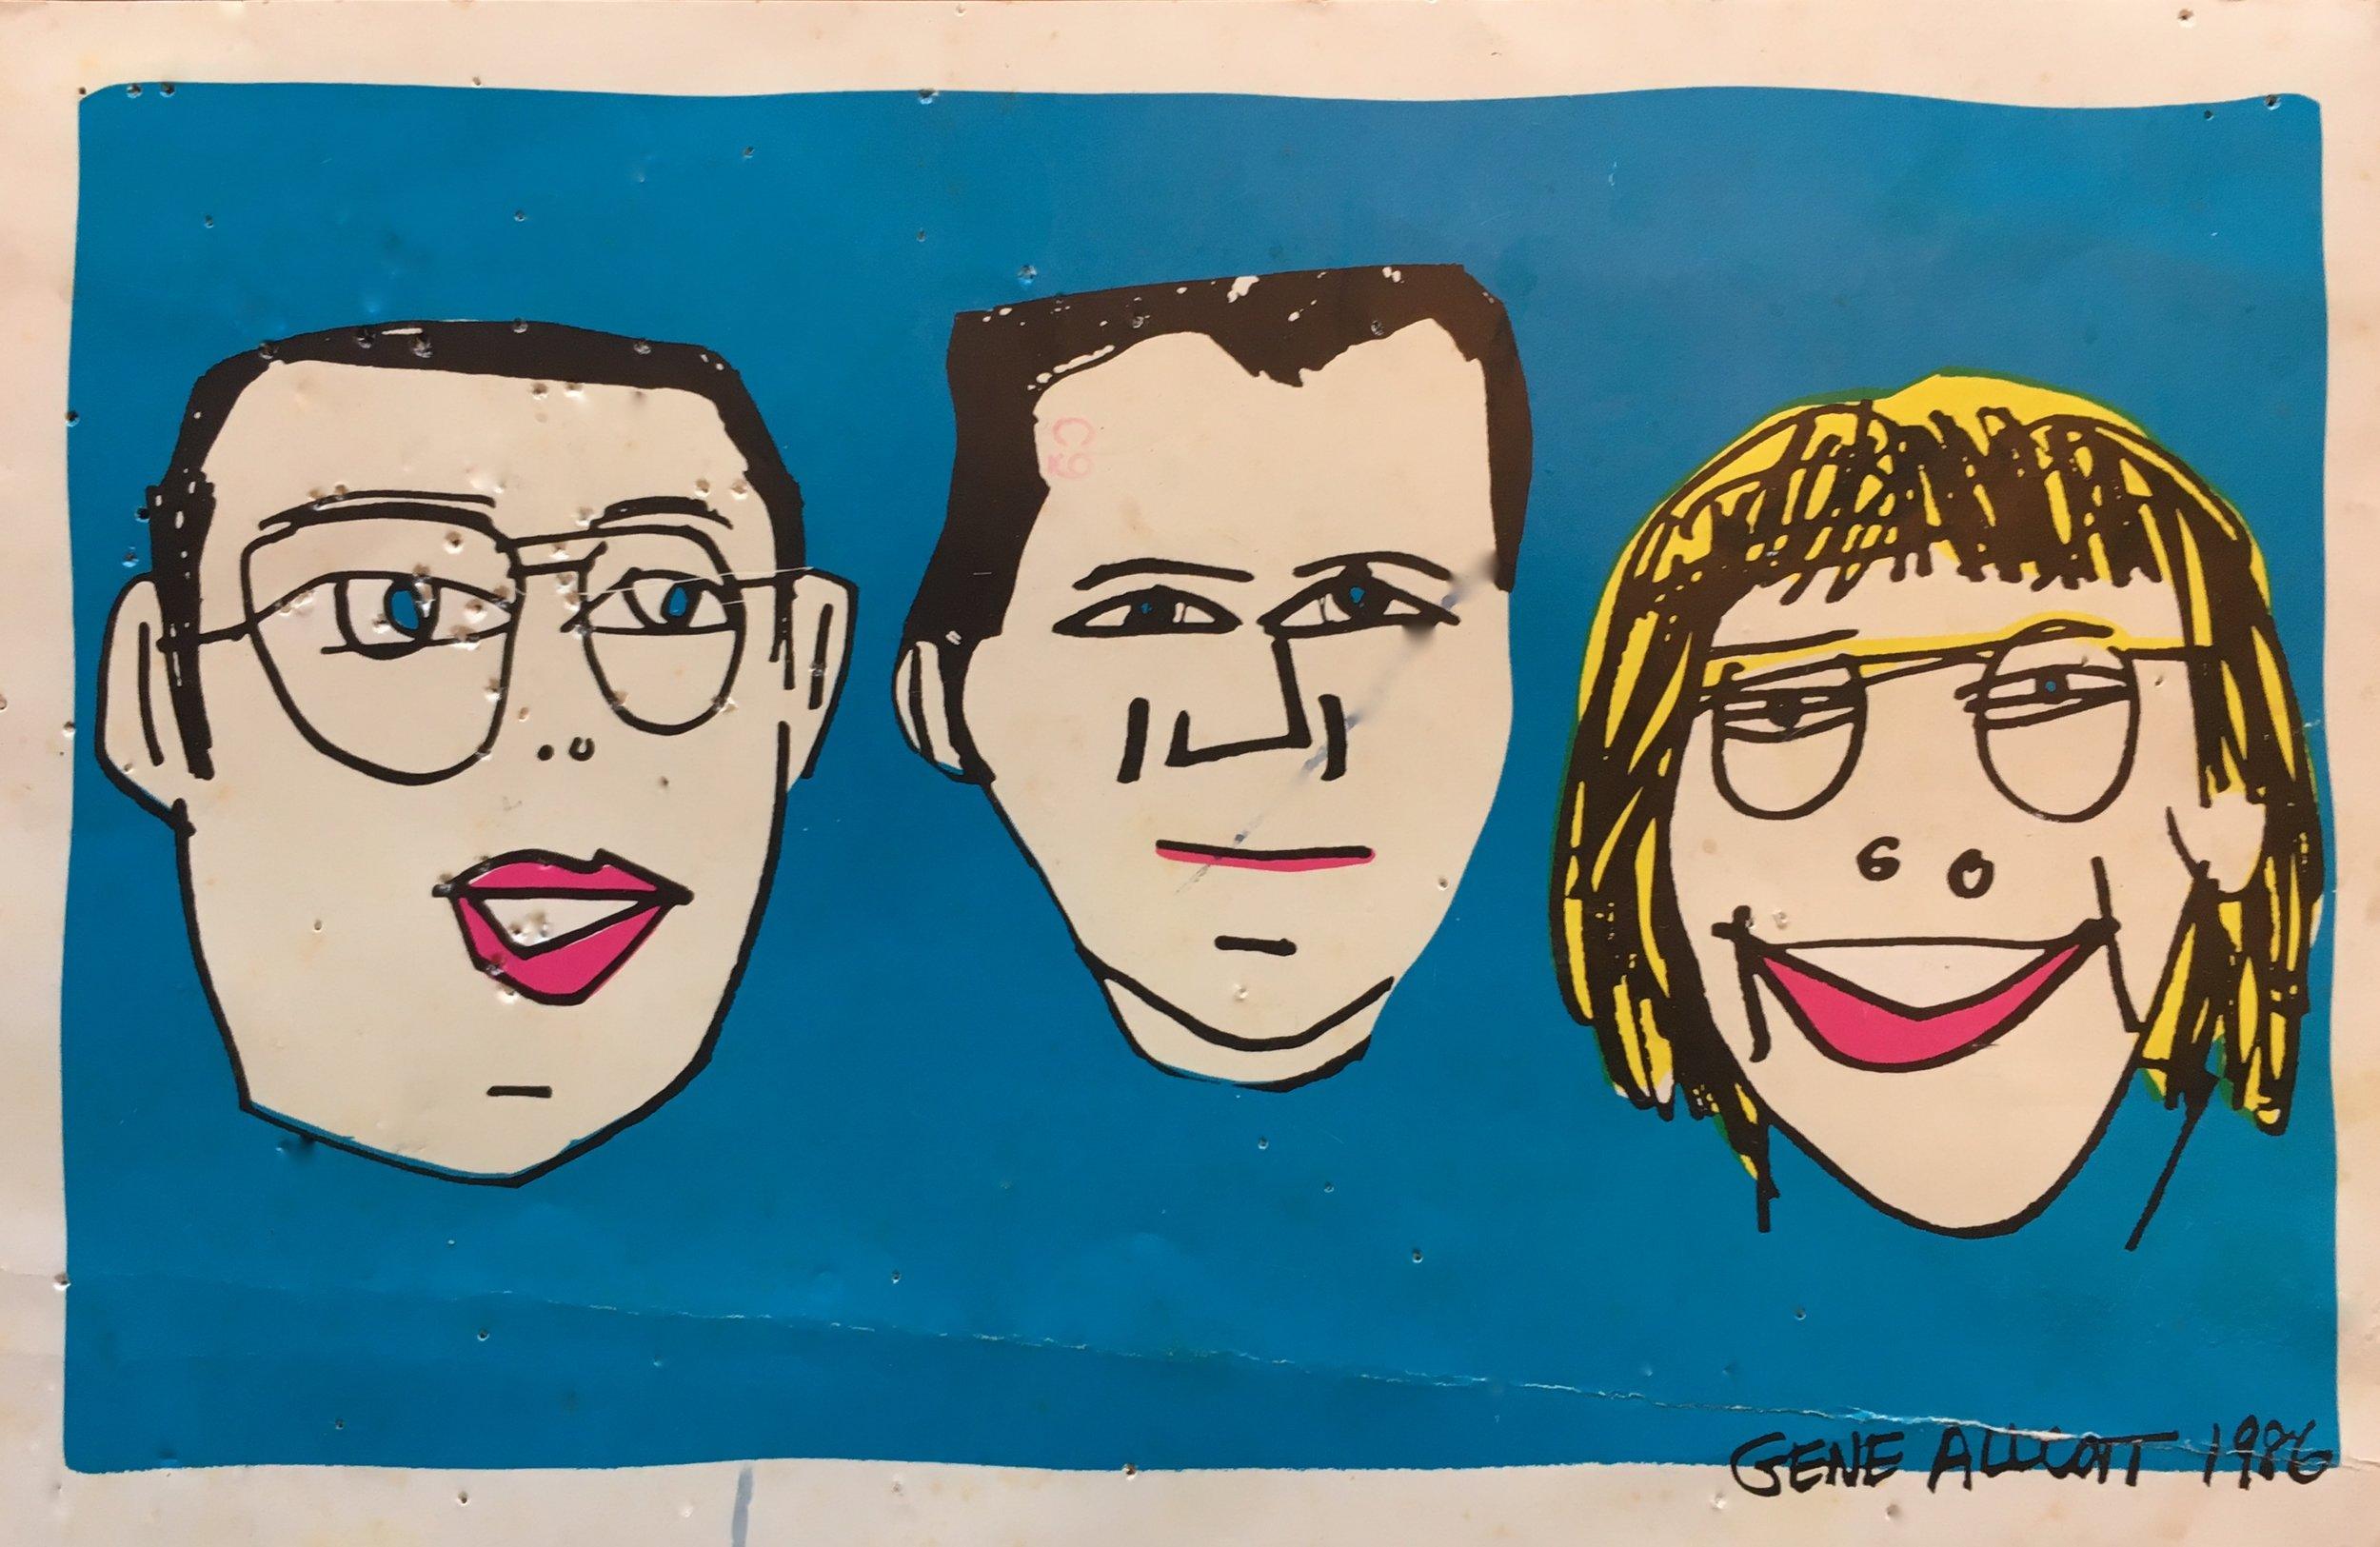 * GA Exhibit 1986 Ersatz Gallery Group, IMG_4508.jpg